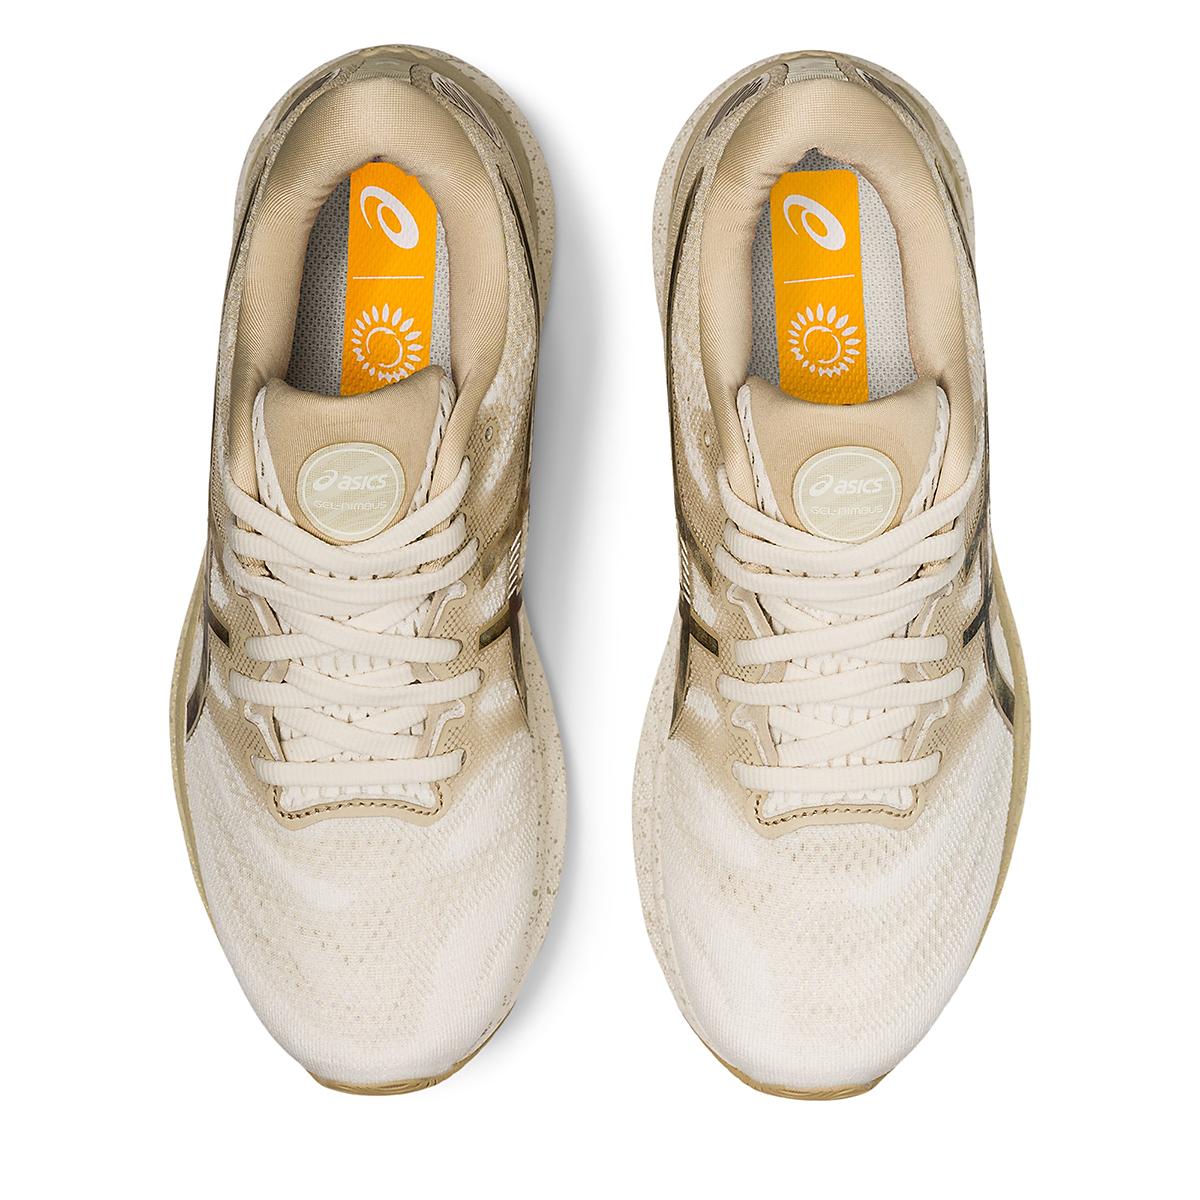 Women's Asics Gel-Nimbus 23 Earth Day Running Shoe - Color: Cream/Putty - Size: 5 - Width: Regular, Cream/Putty, large, image 3